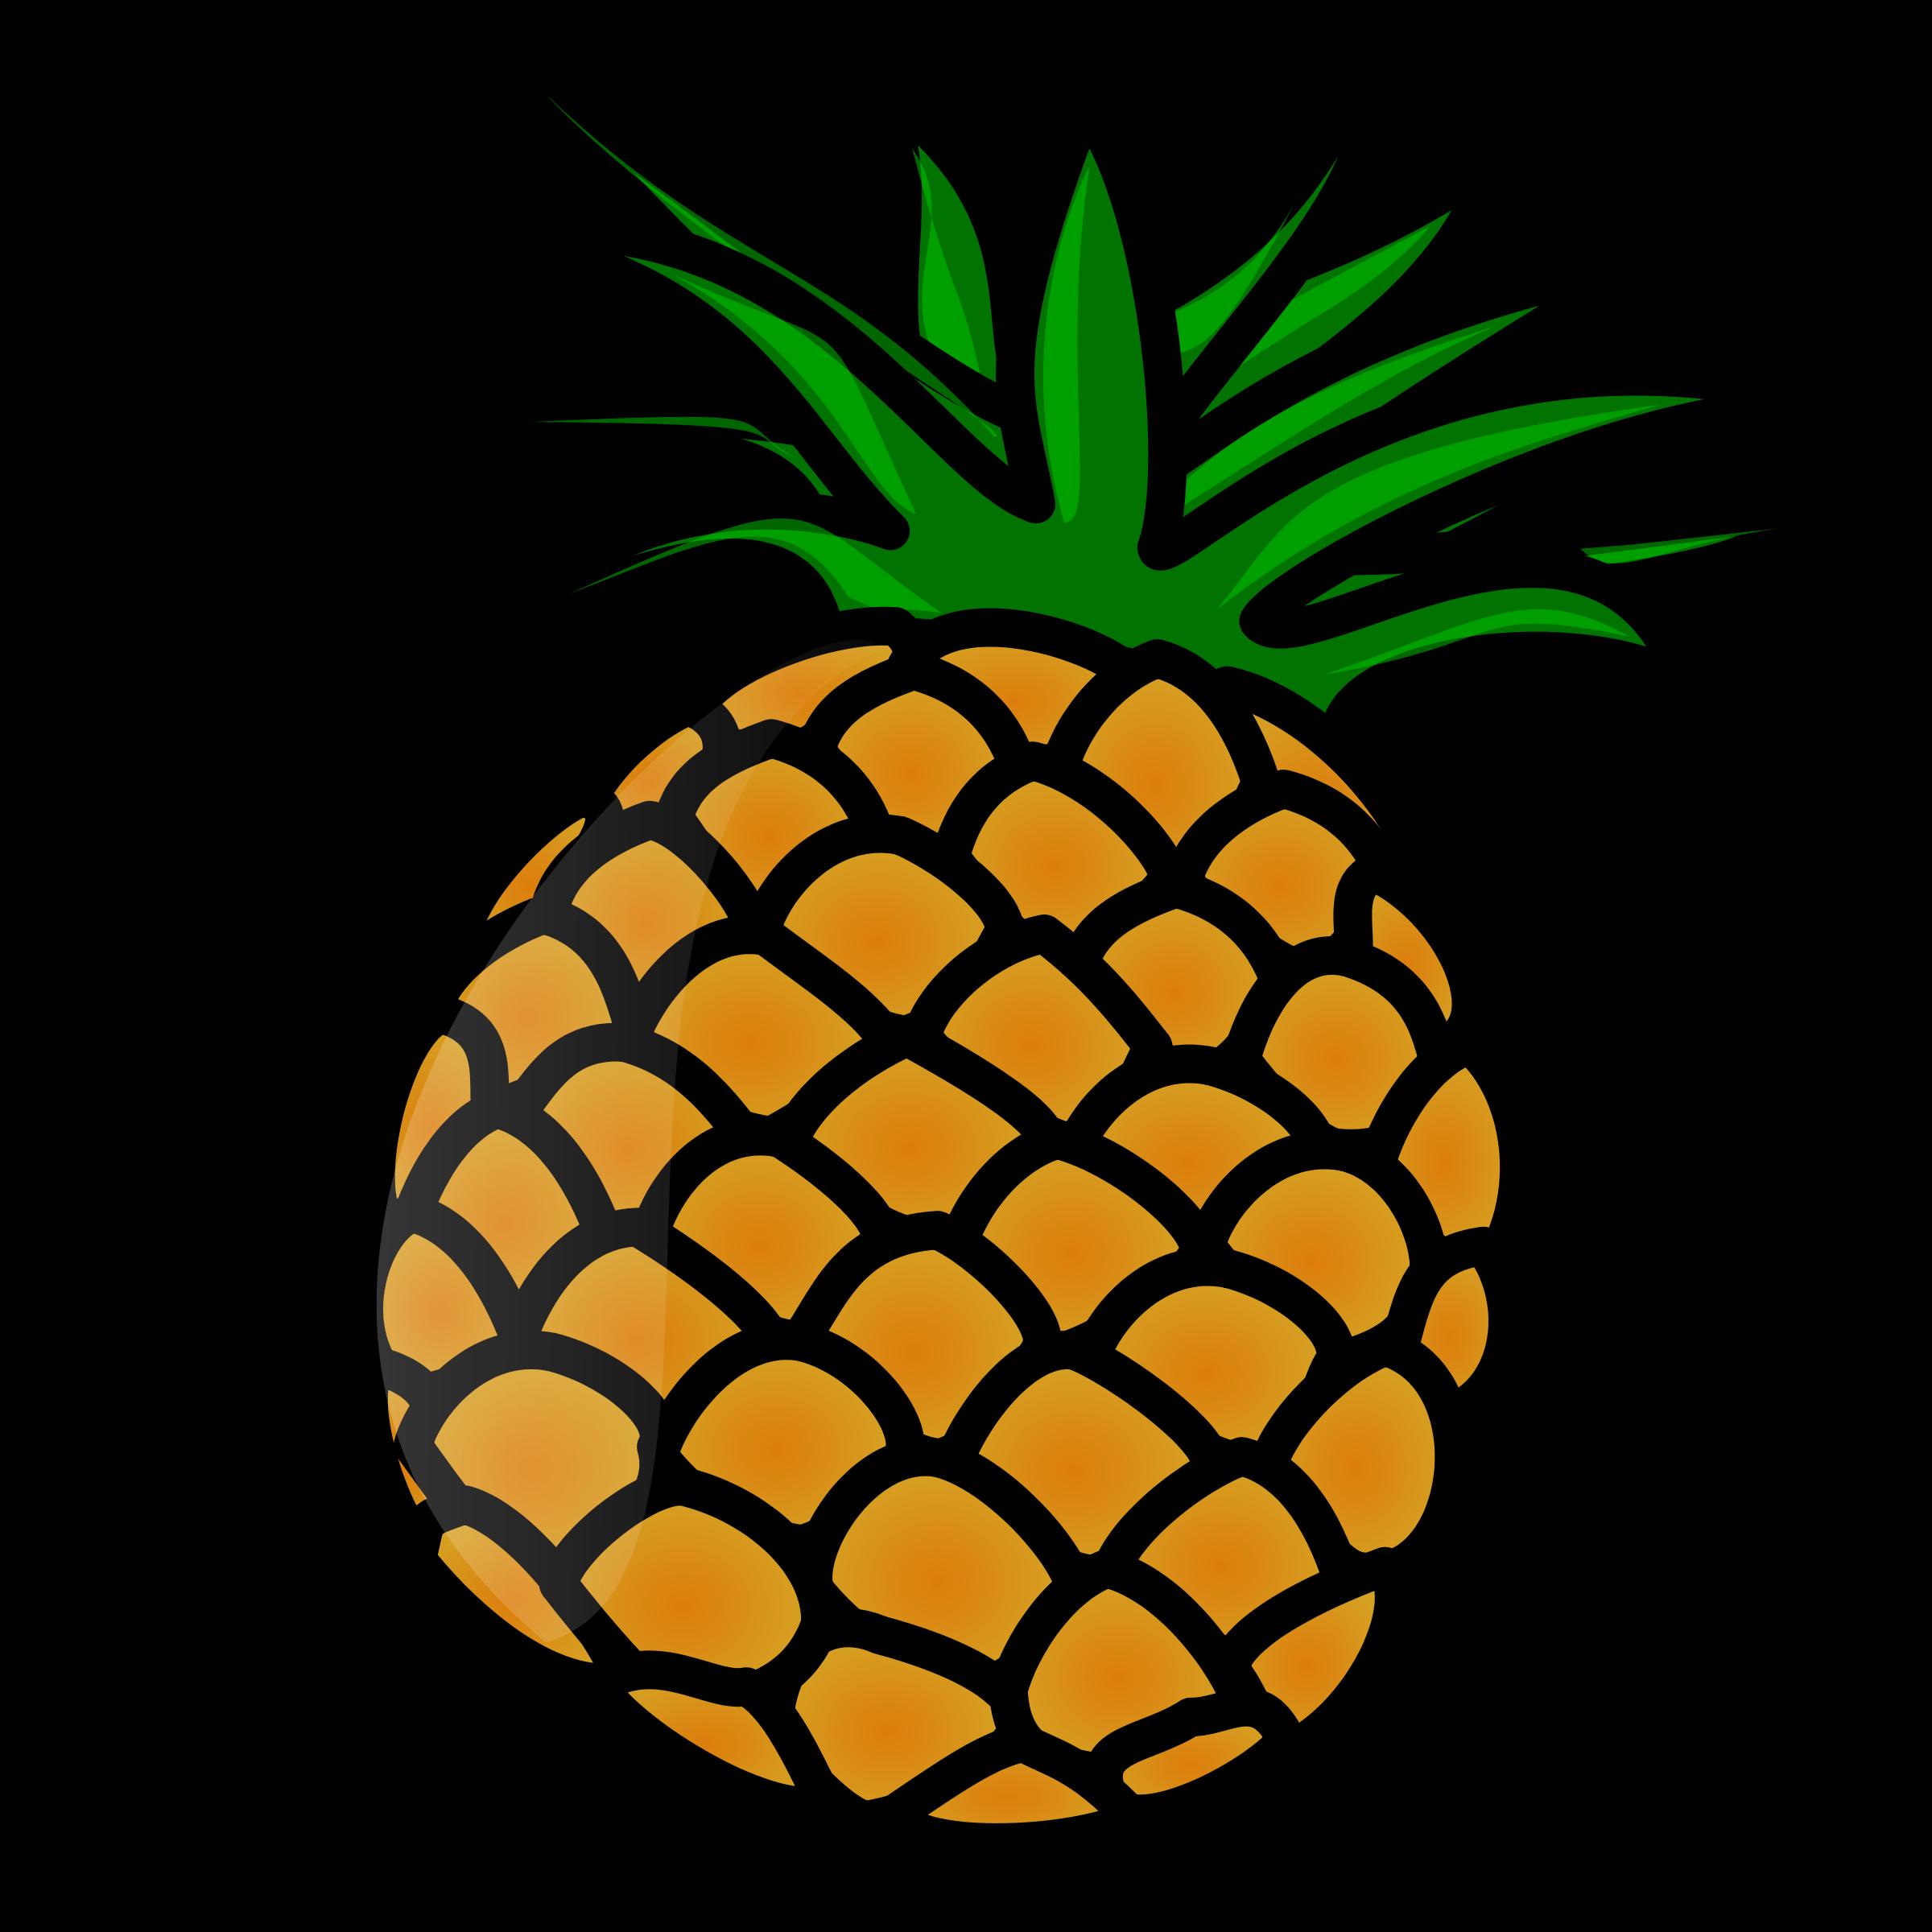 Ananas clipart.